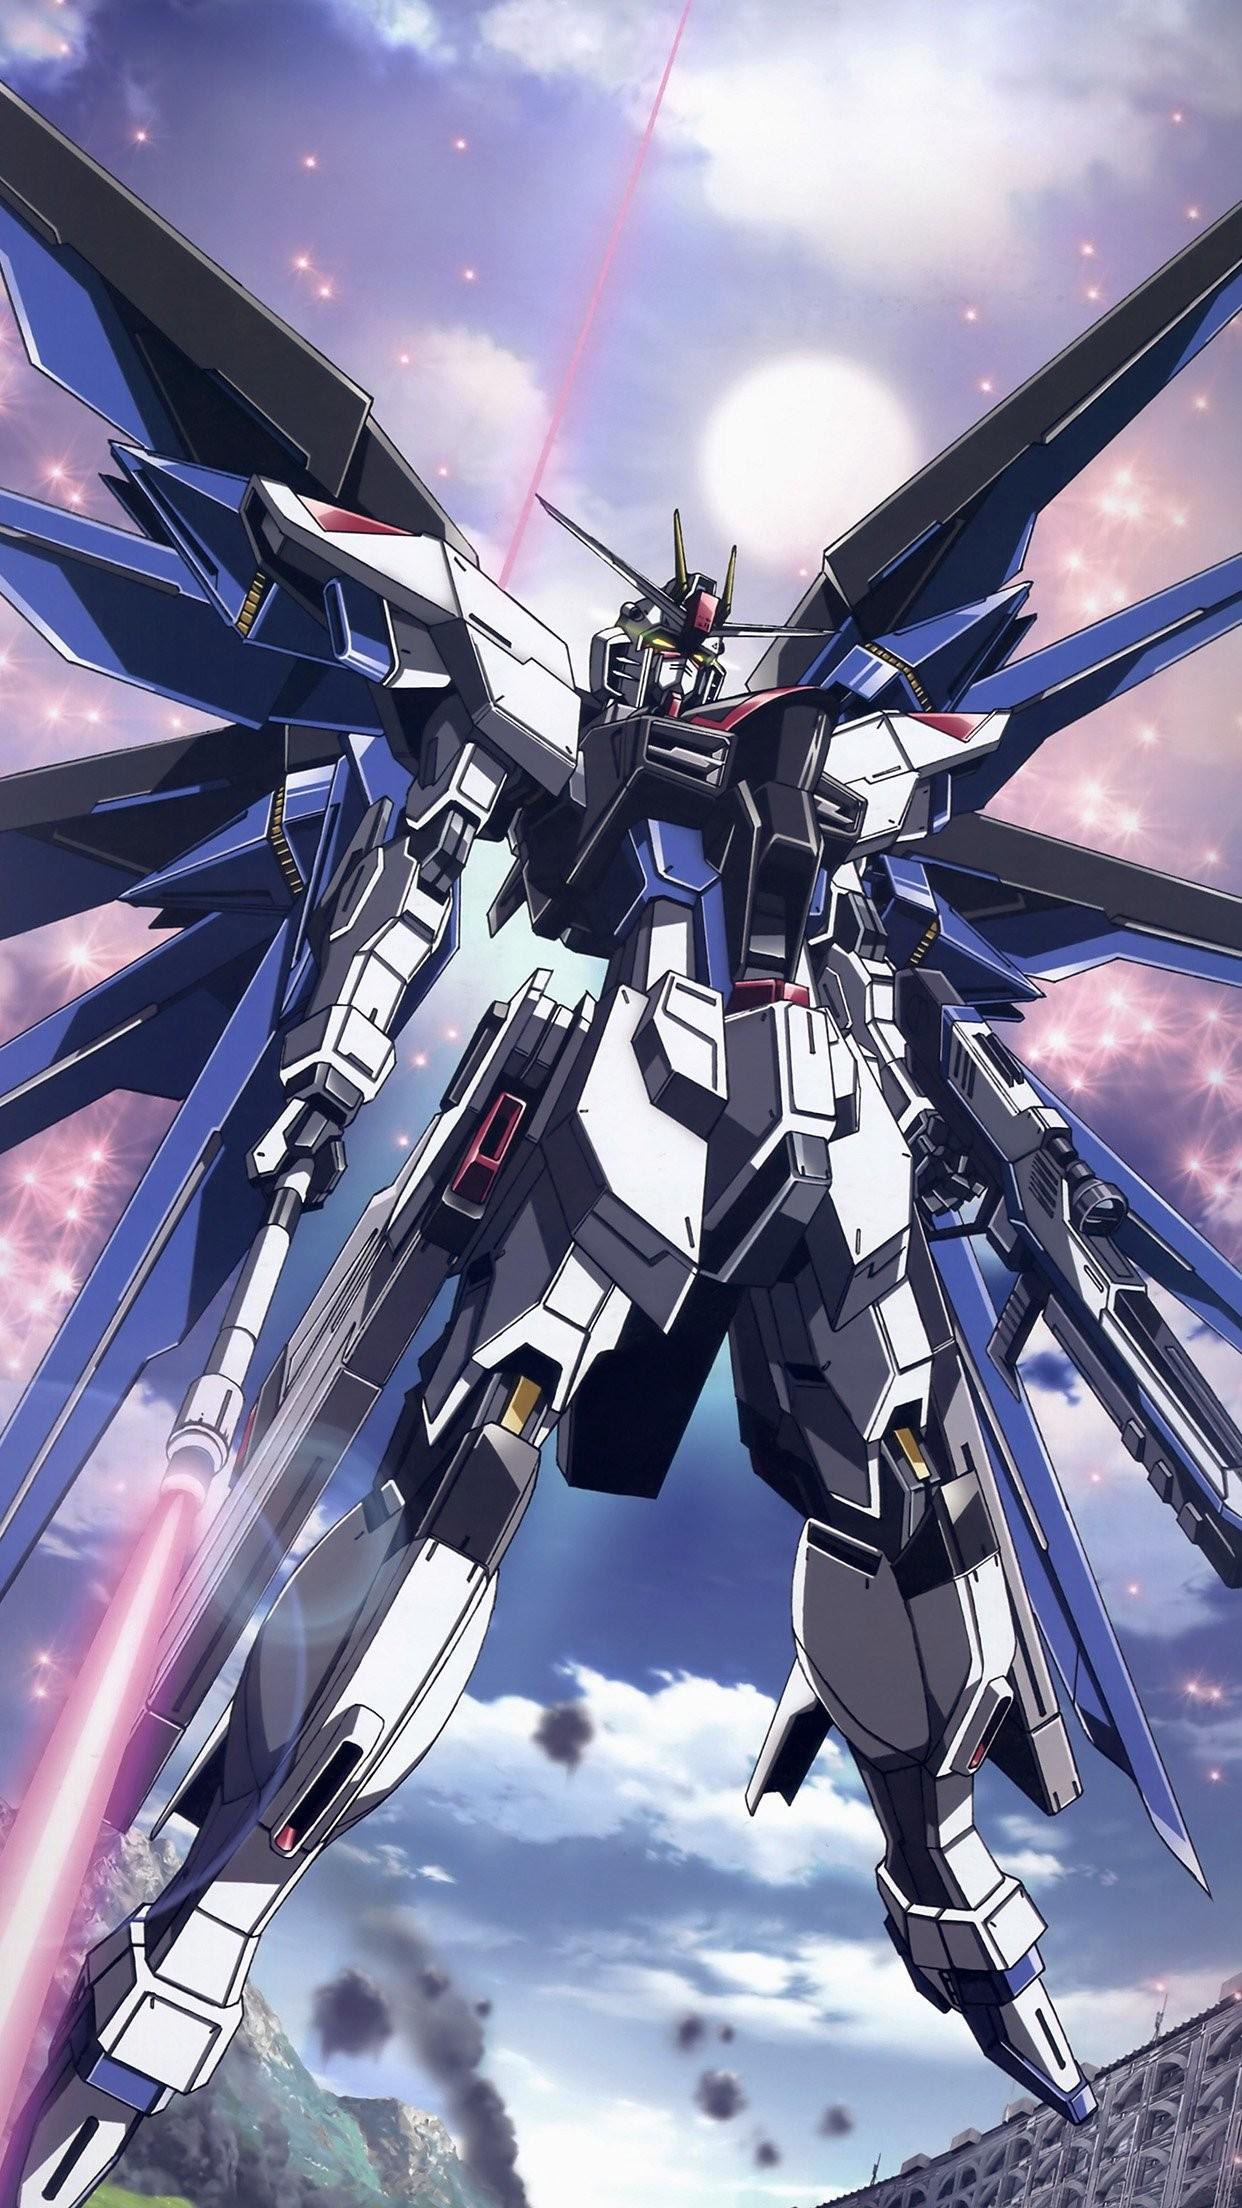 Gundam wallpapers 65 images - Gundam wallpaper hd ...